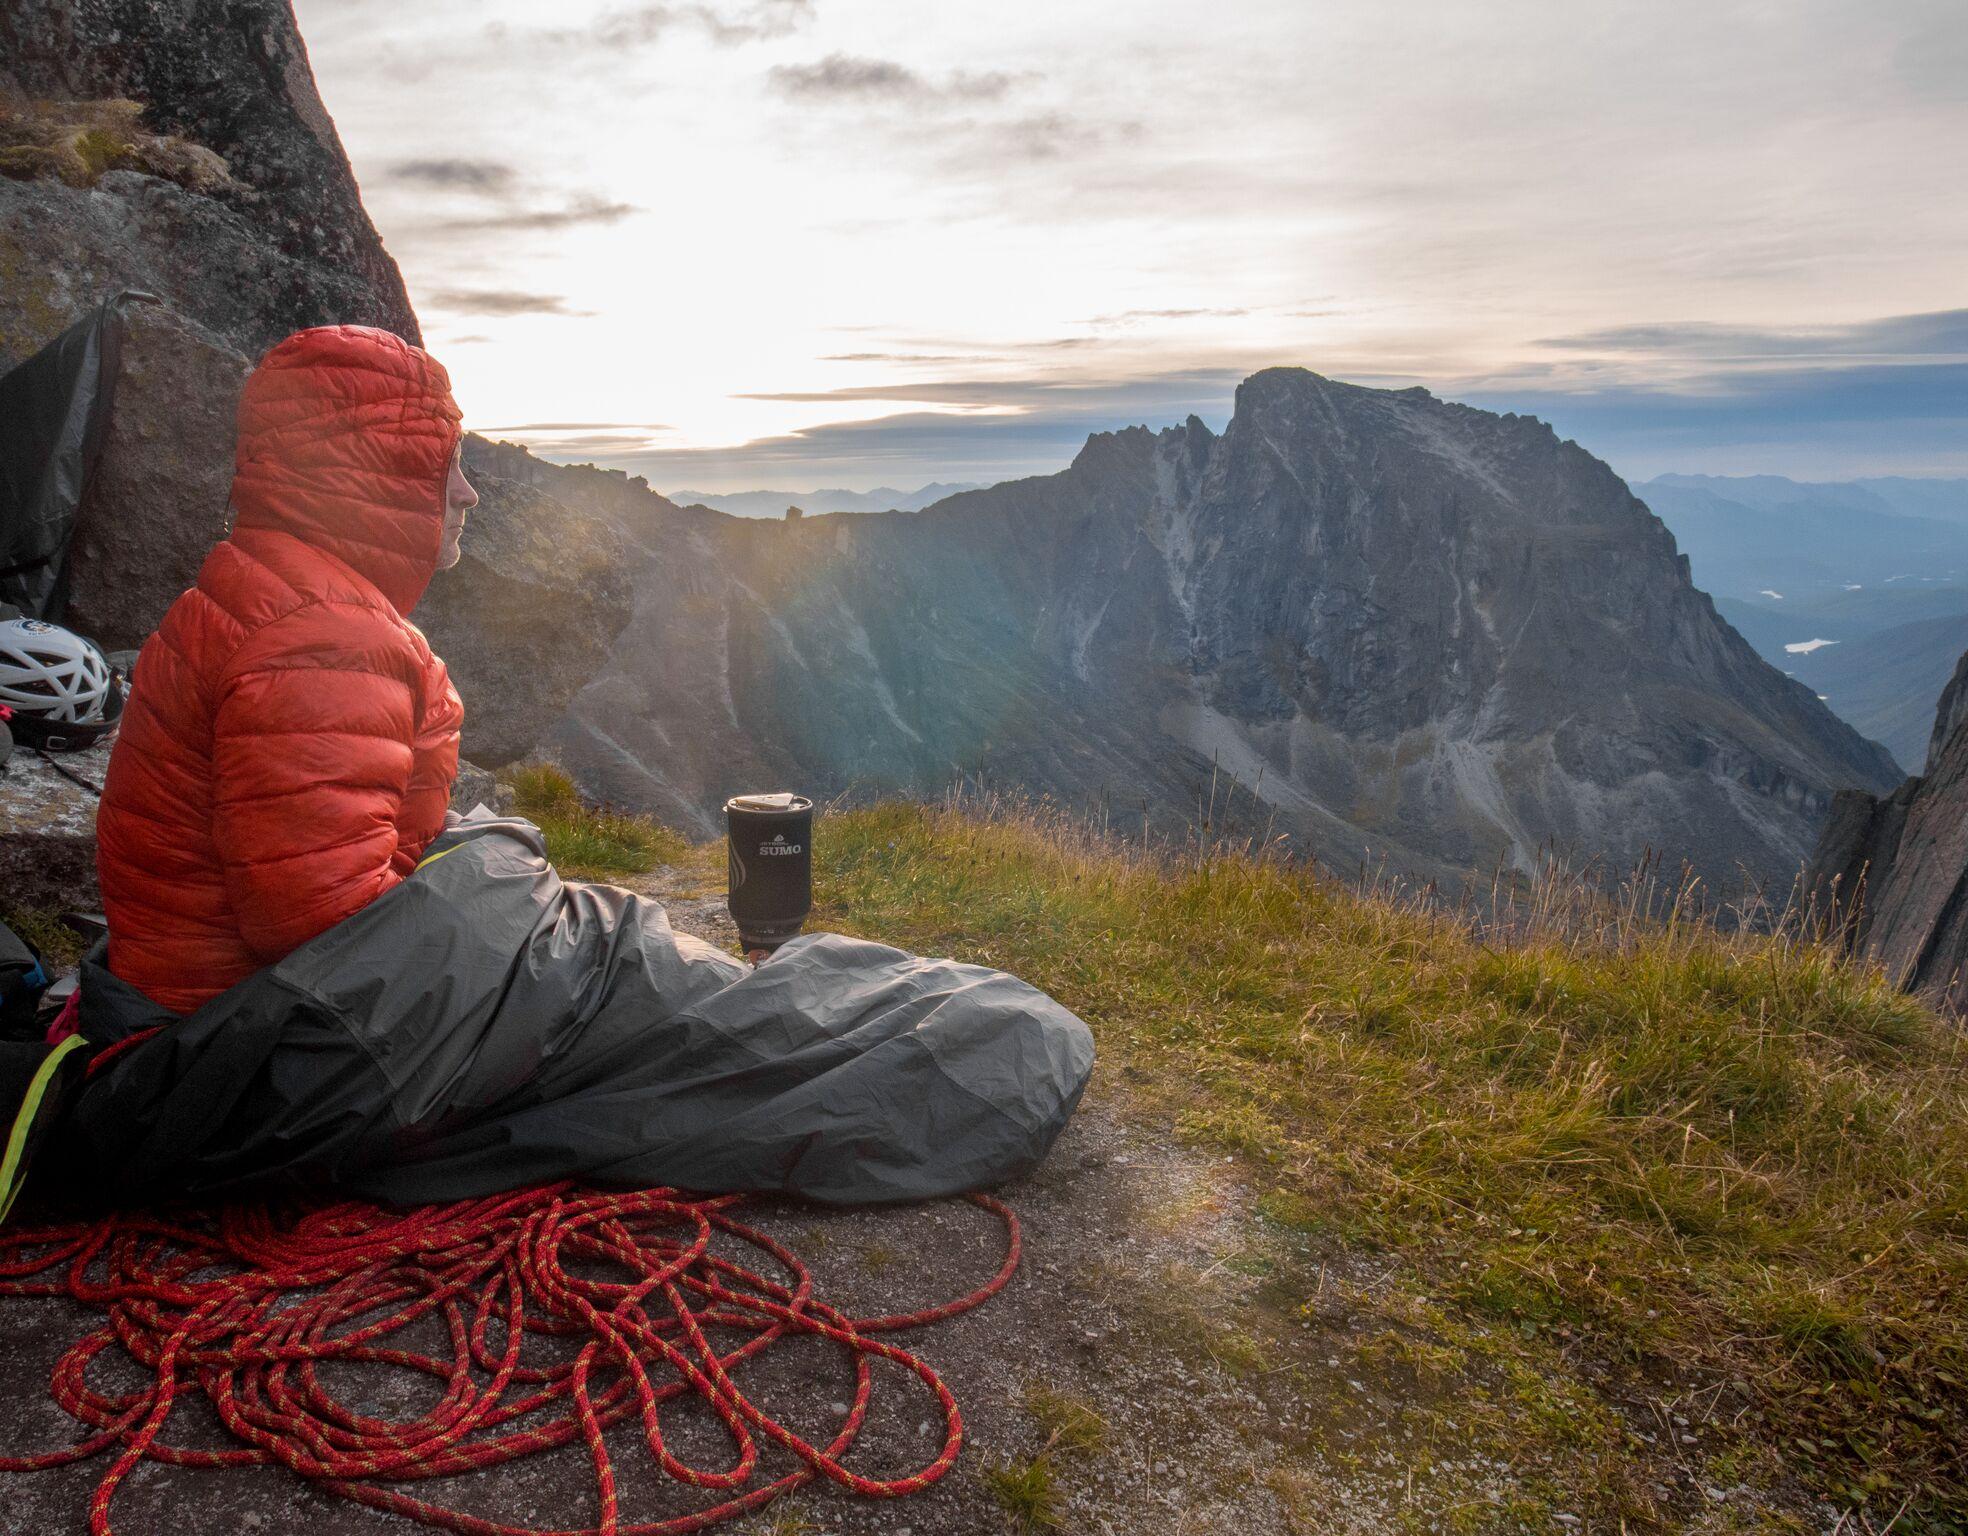 Jim enjoying breakfast on the bivy ledge. PC: Taylor Zann